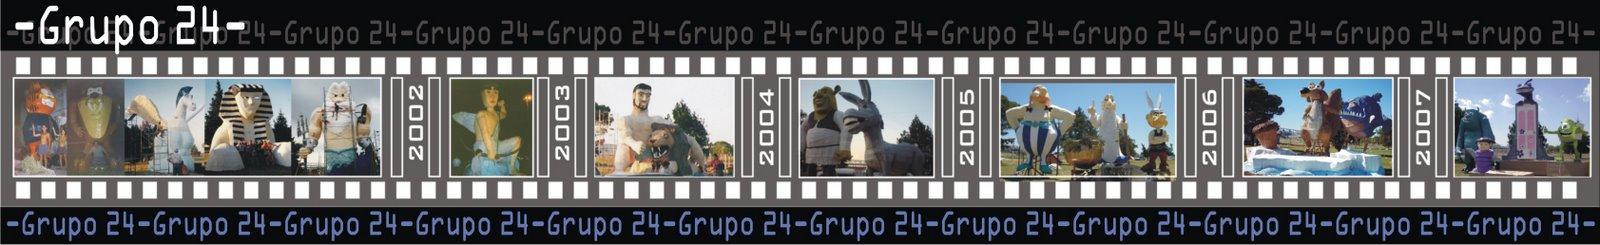 Grupo 24